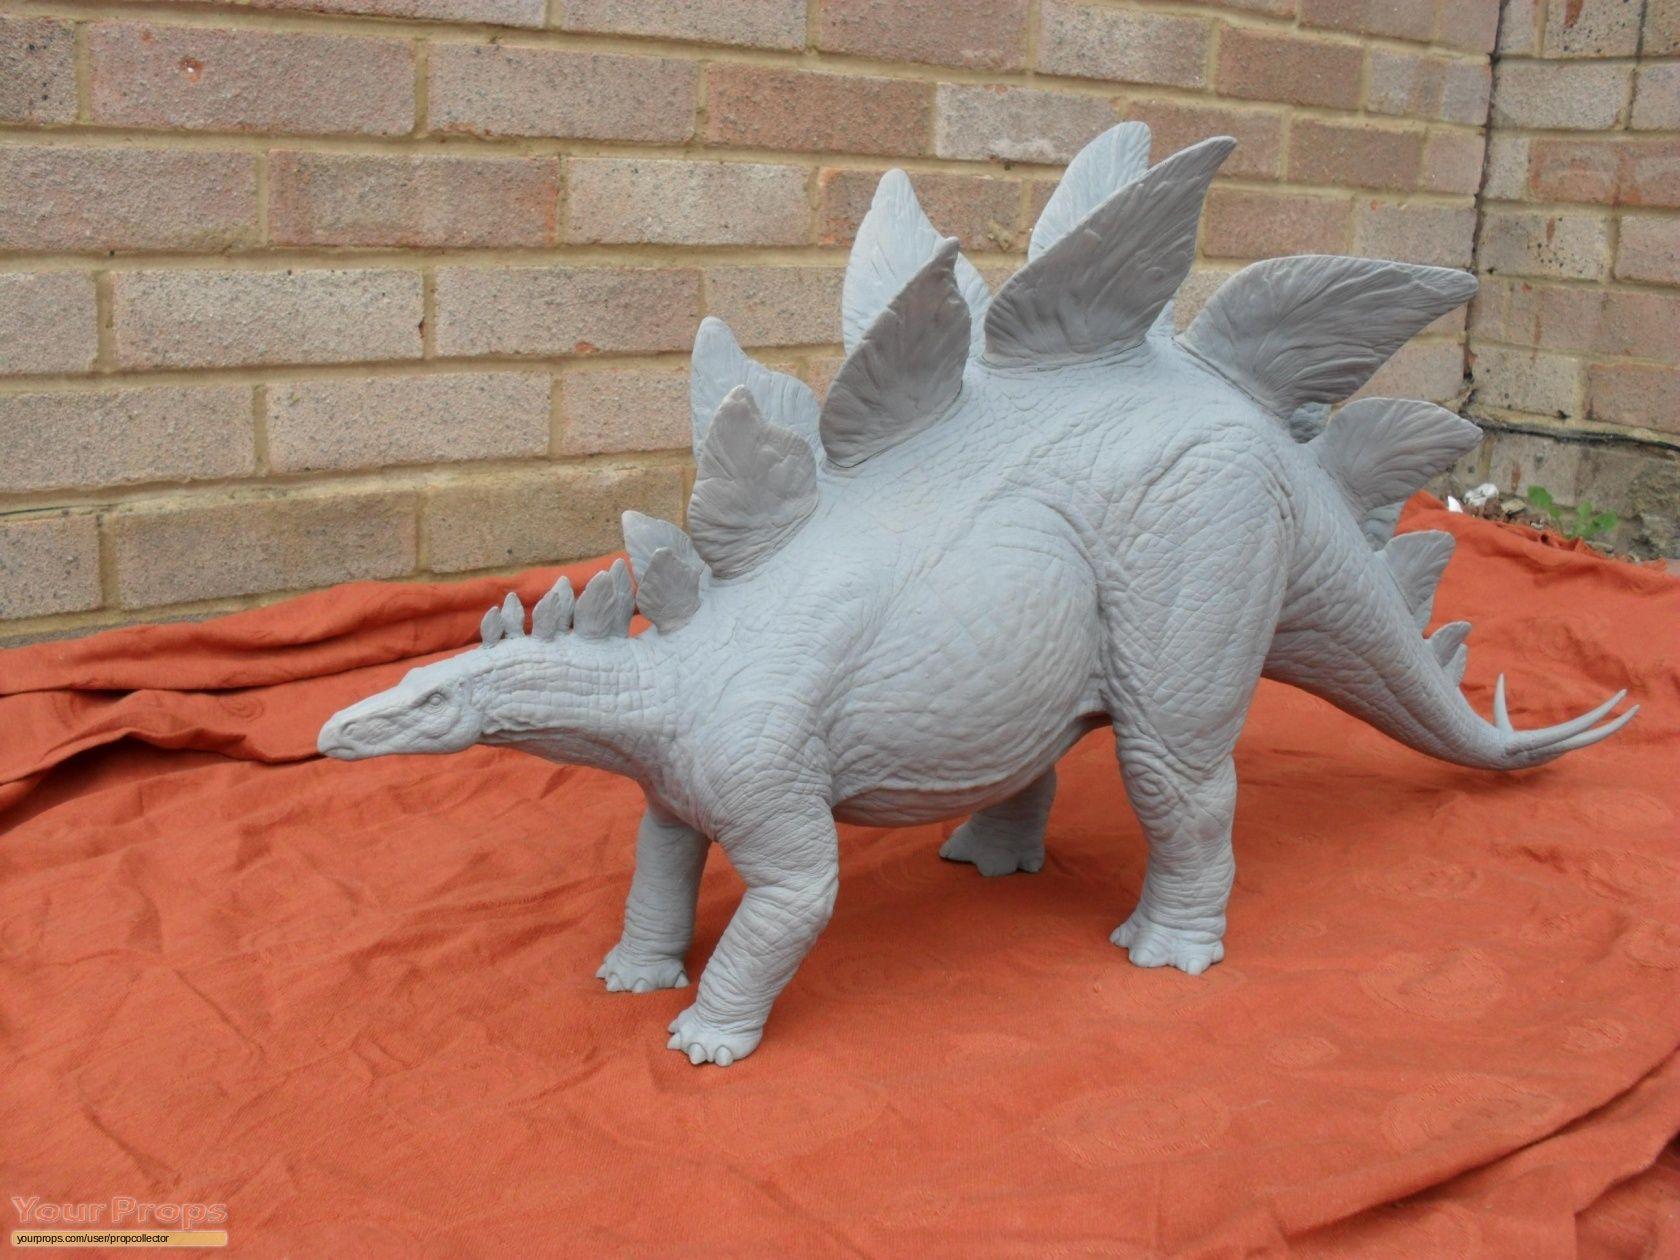 The Lost World Jurassic Park Stegosaurus maquette